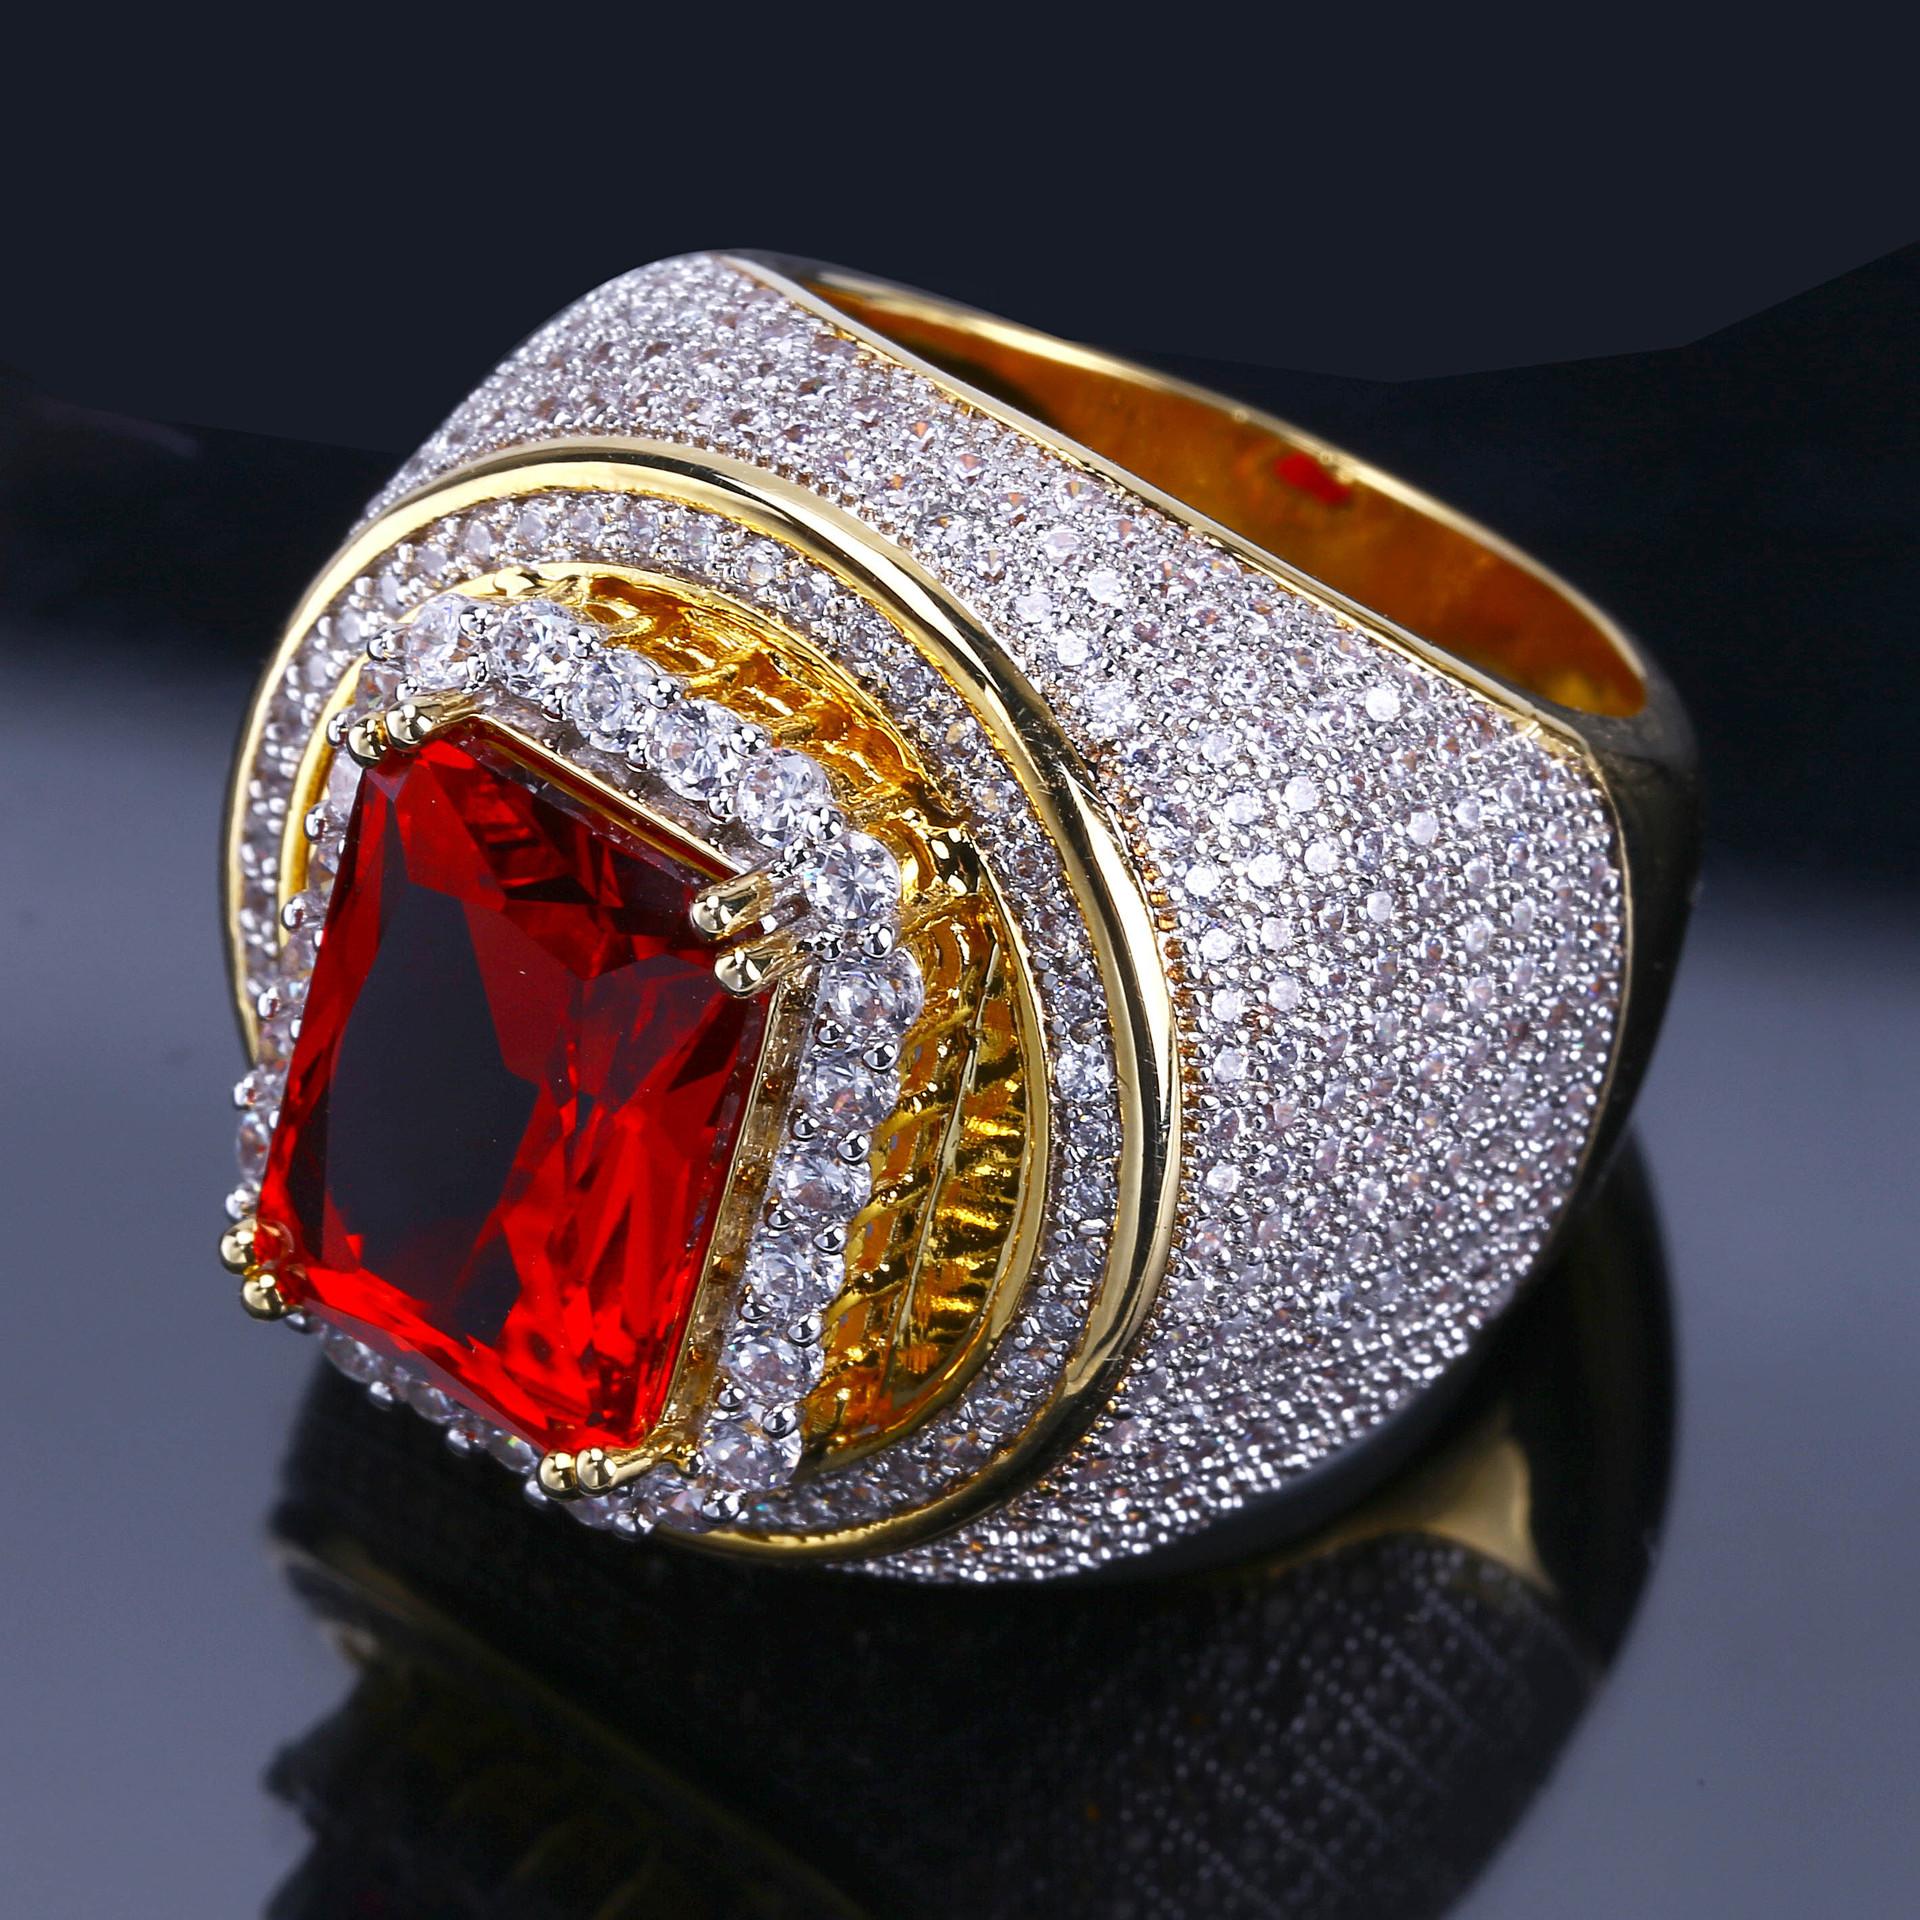 Charm Red Ruby Blanc Zircone cubique 18K Jaune Plaqué Or Femme Bague Taille 6 7 8